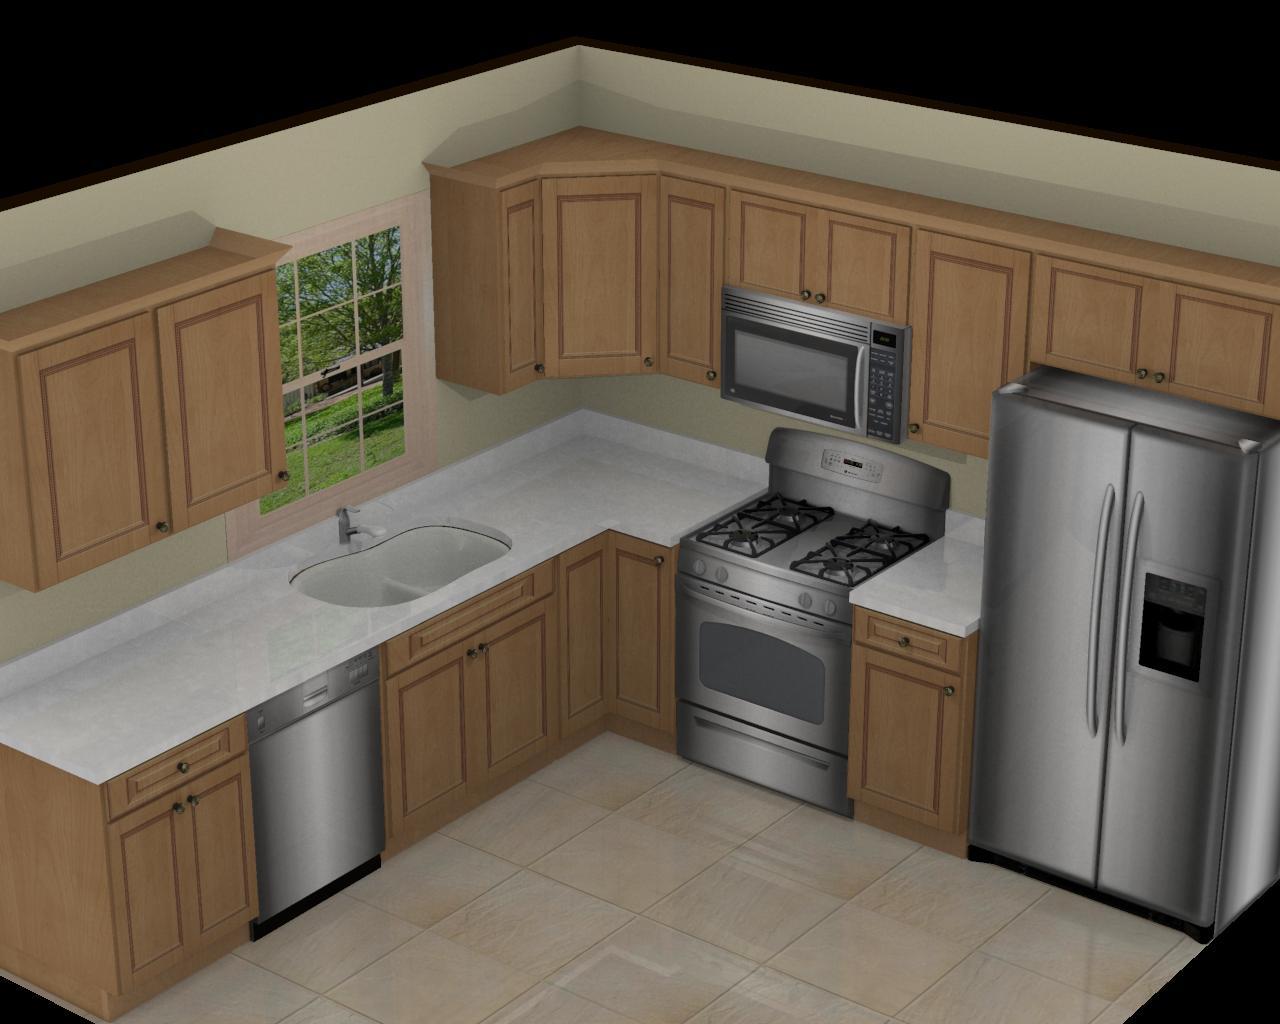 kitchen remodel decor ideasdecor ideas type kitchen dining